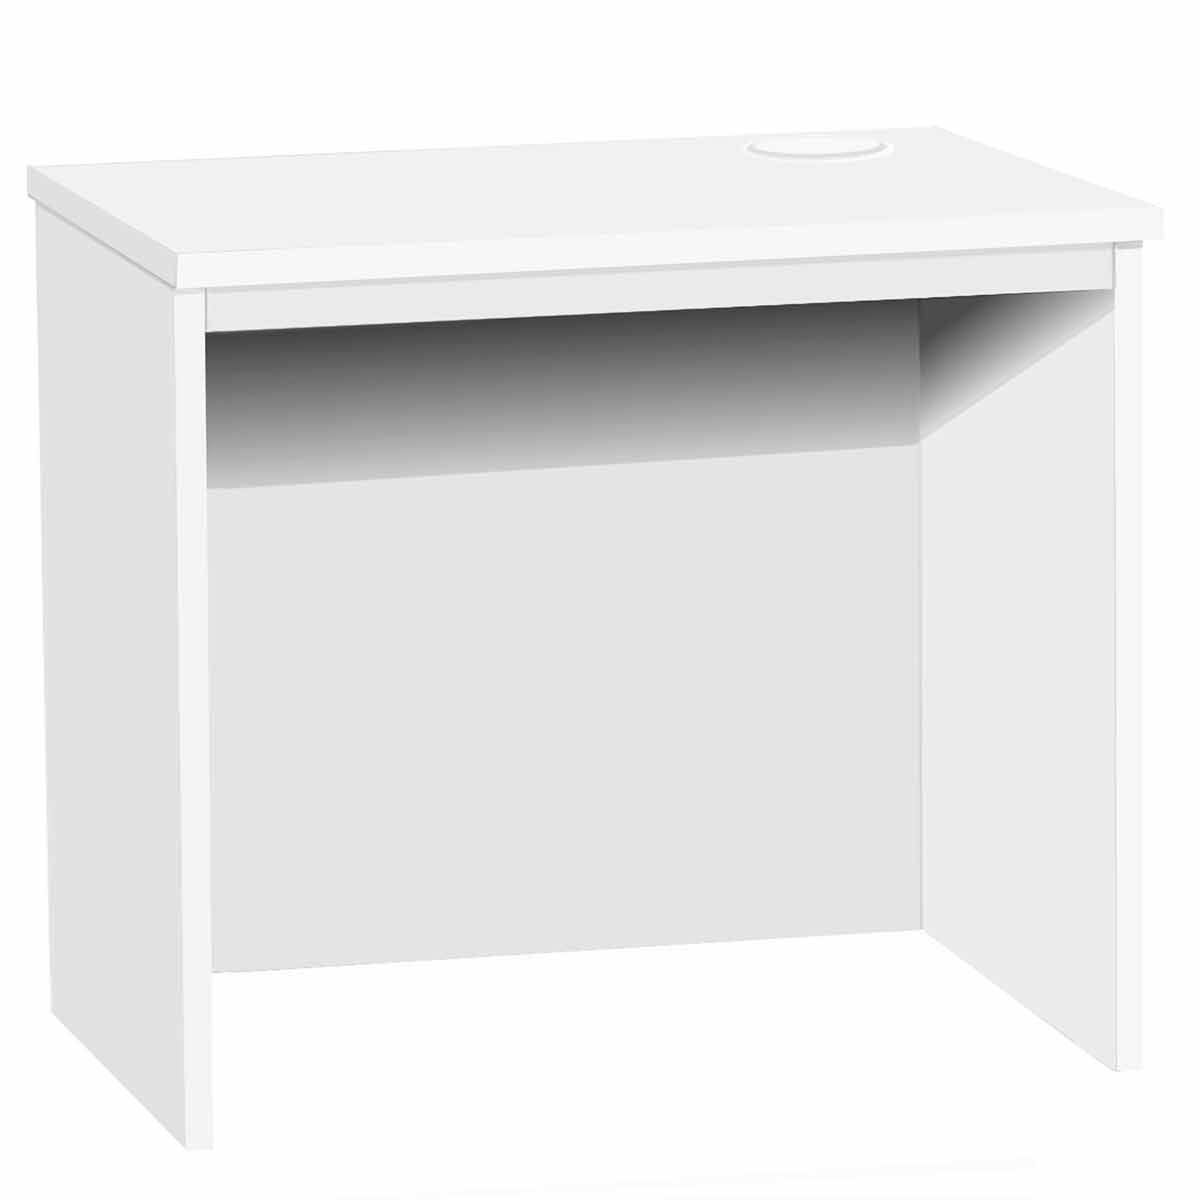 R White Medium Desk 850mm Wide White